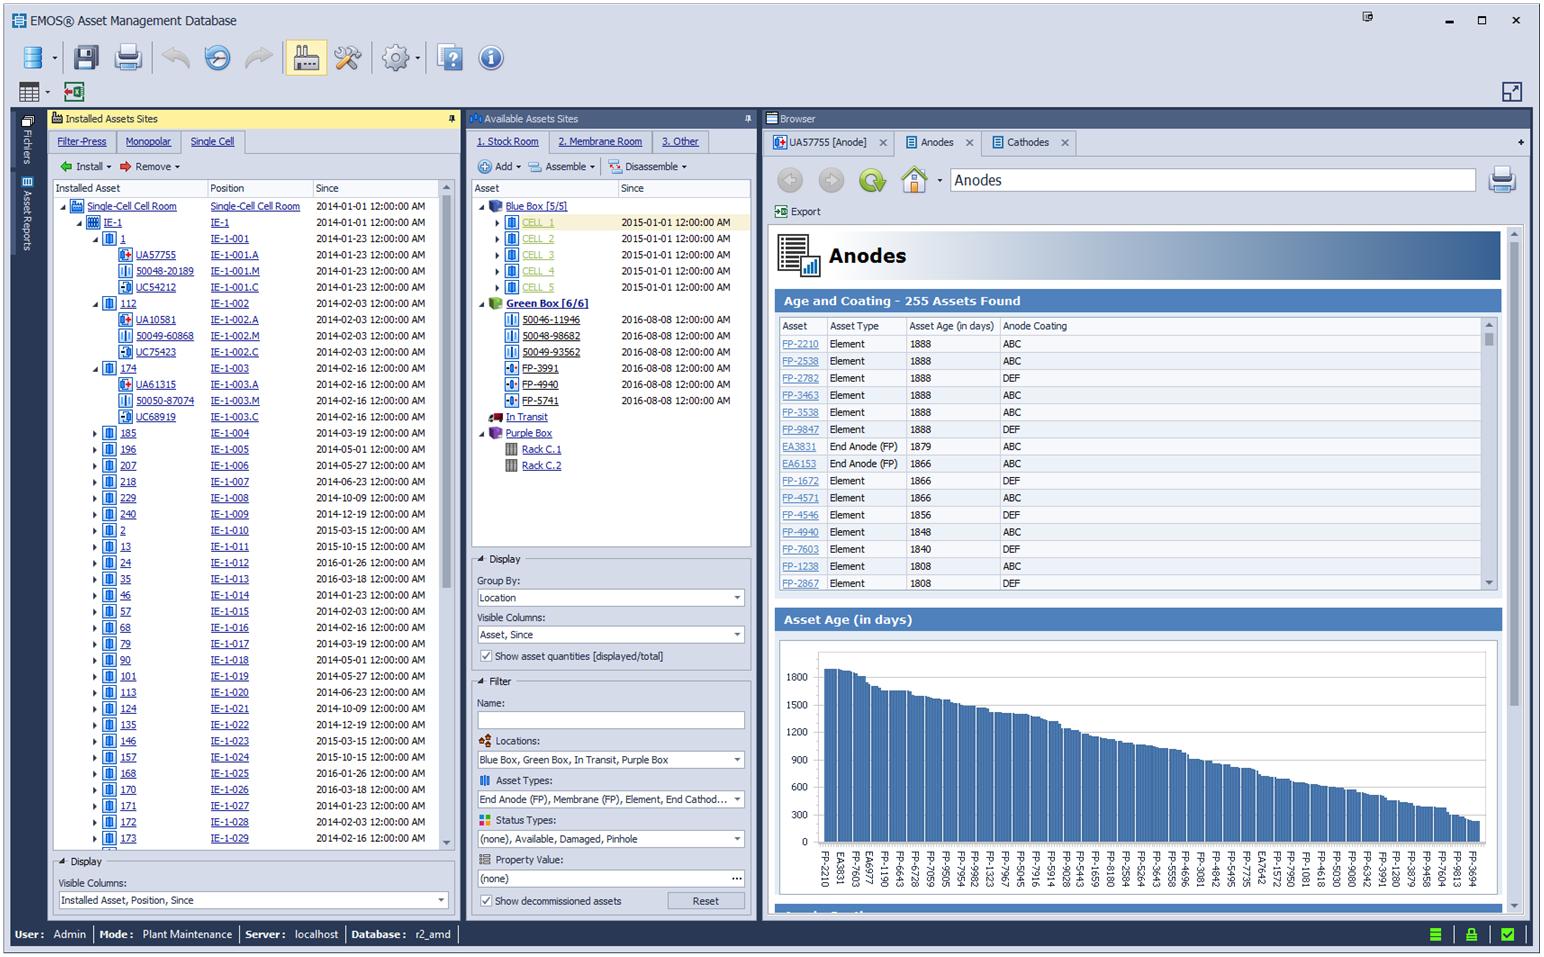 EMOS® Asset Management Database | R2